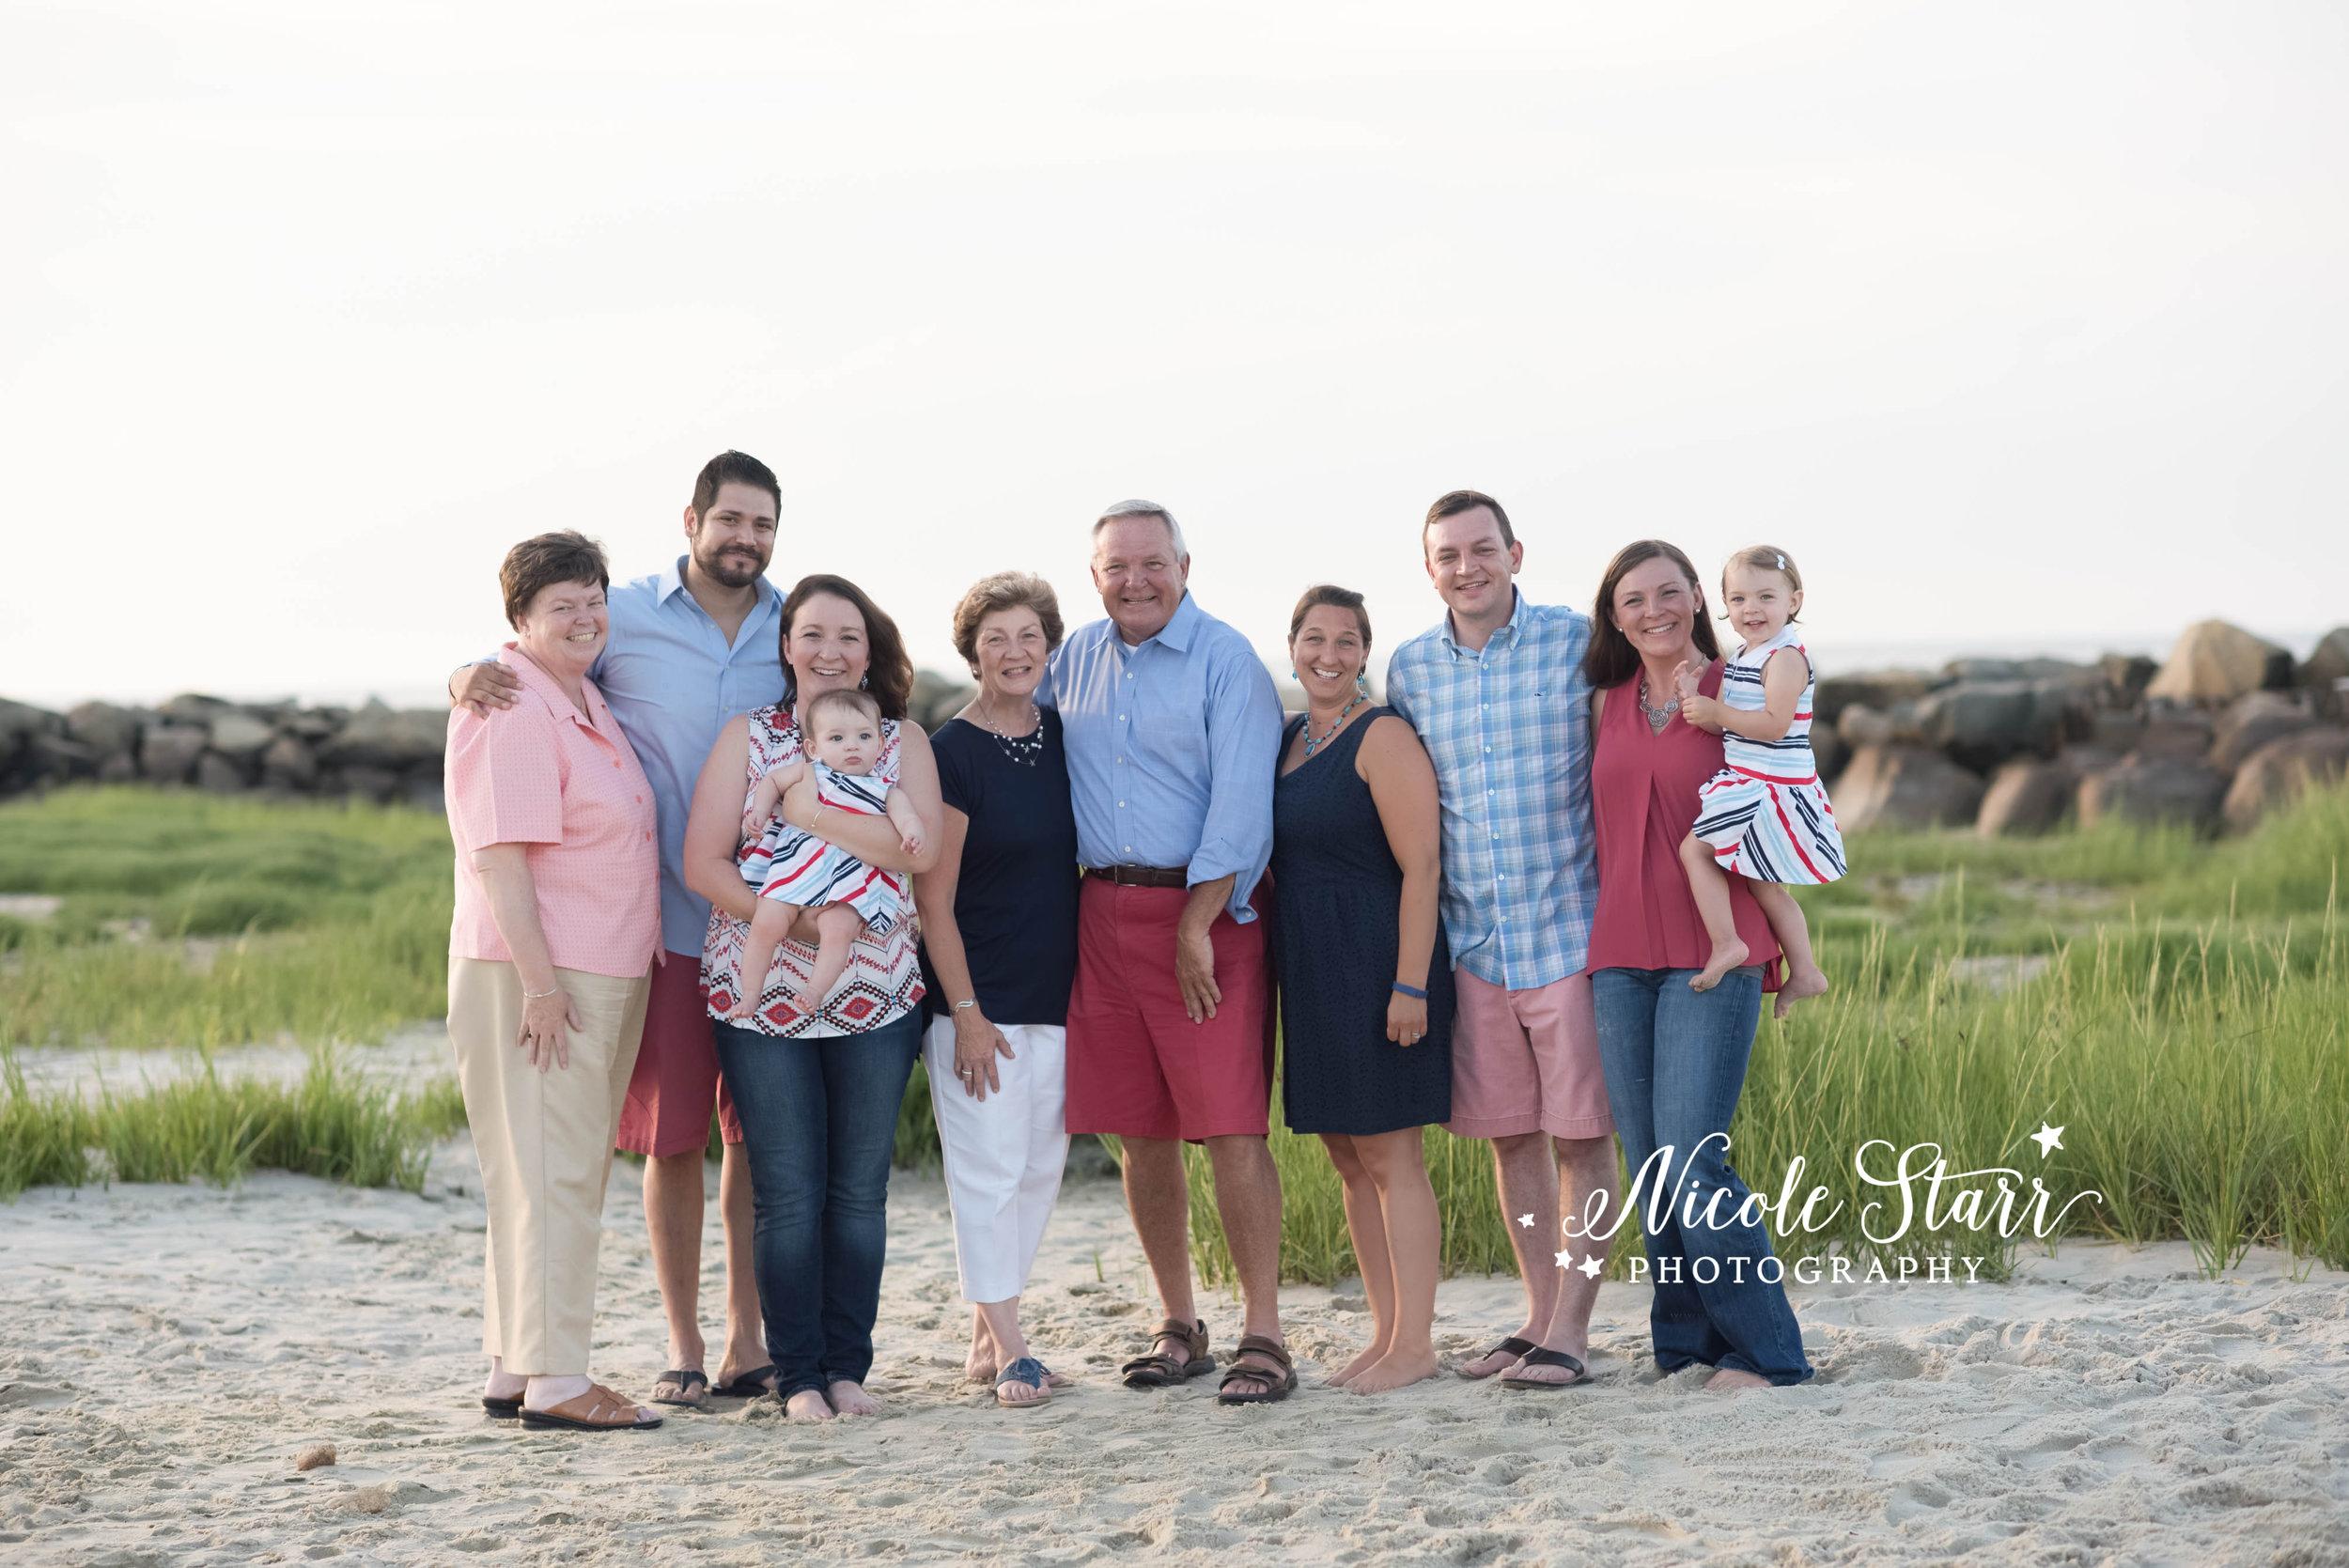 Nicole Starr Photography   Cape Cod Family Photographer     Cape Cod beach photo session     Boston Family Photographer   Family Photographer